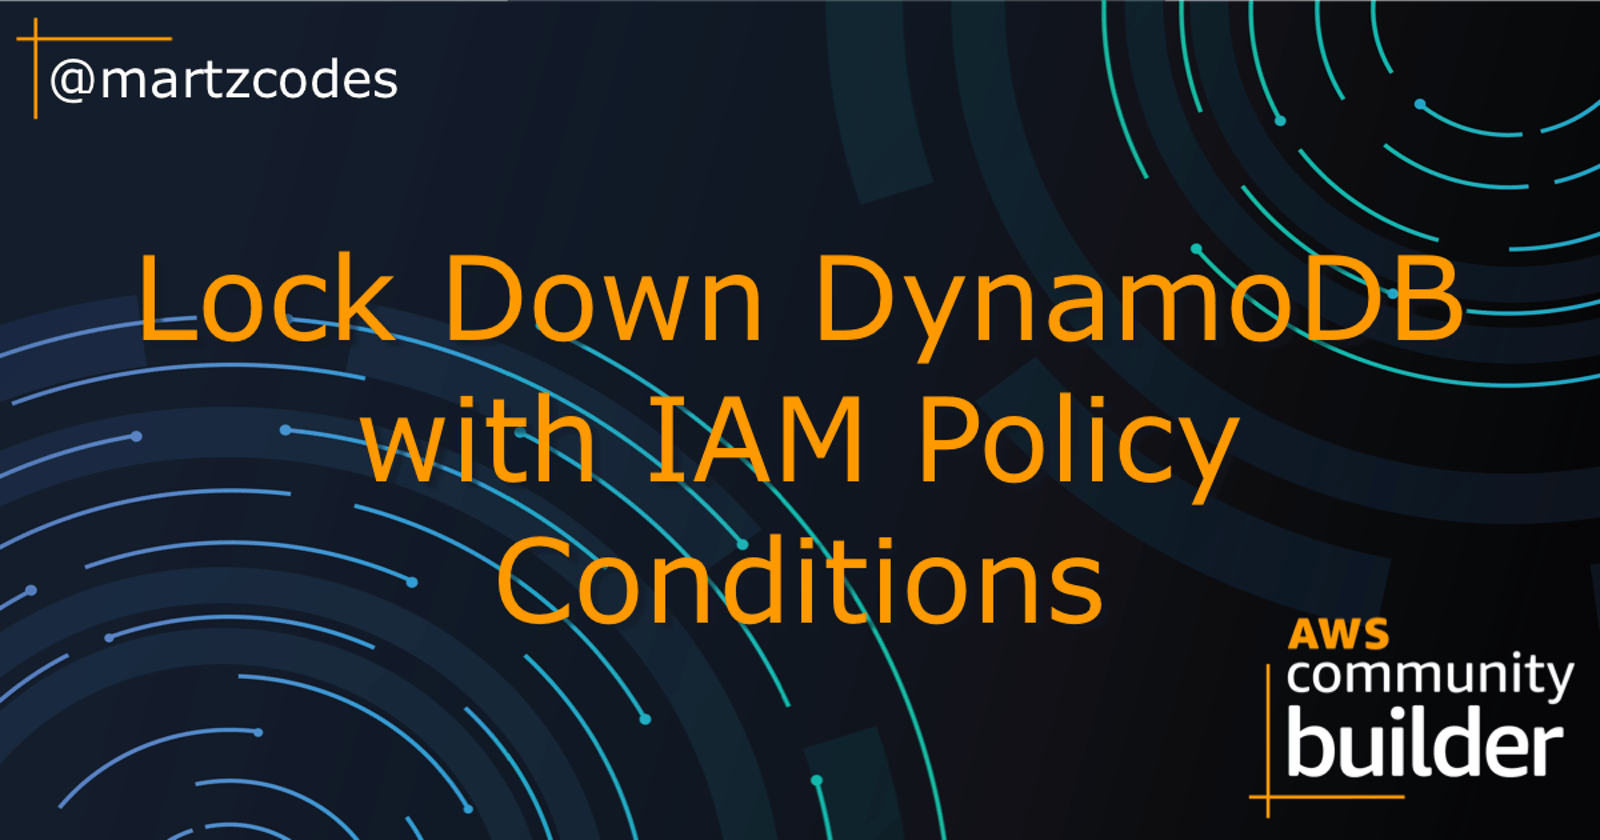 Lock Down DynamoDB with IAM Policy Conditions